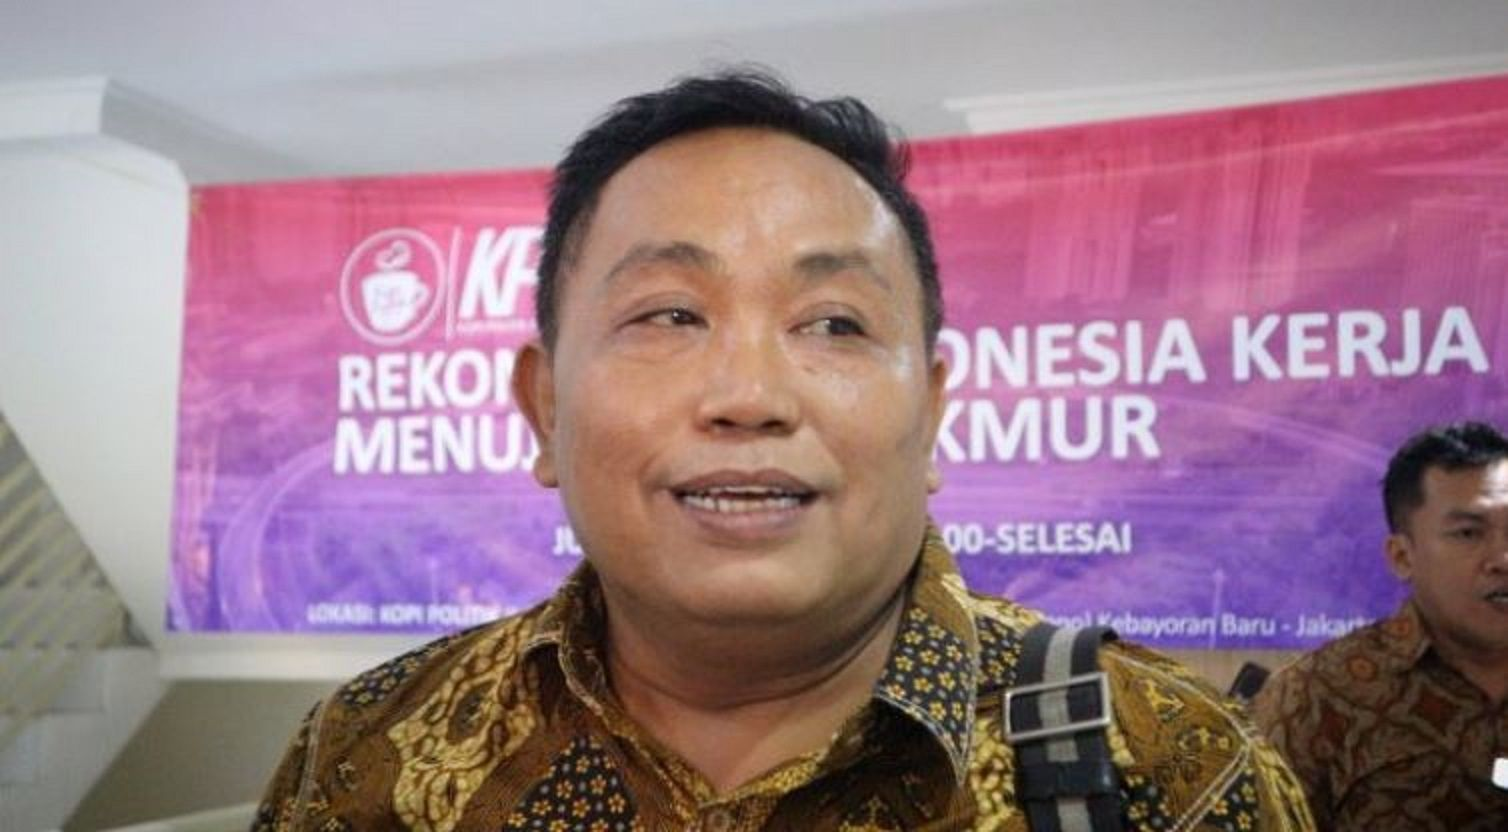 Ini Alasan Arief Poyuono Minta Anies Baswedan Segera Dinonaktifkan Sebagai Gubernur DKI